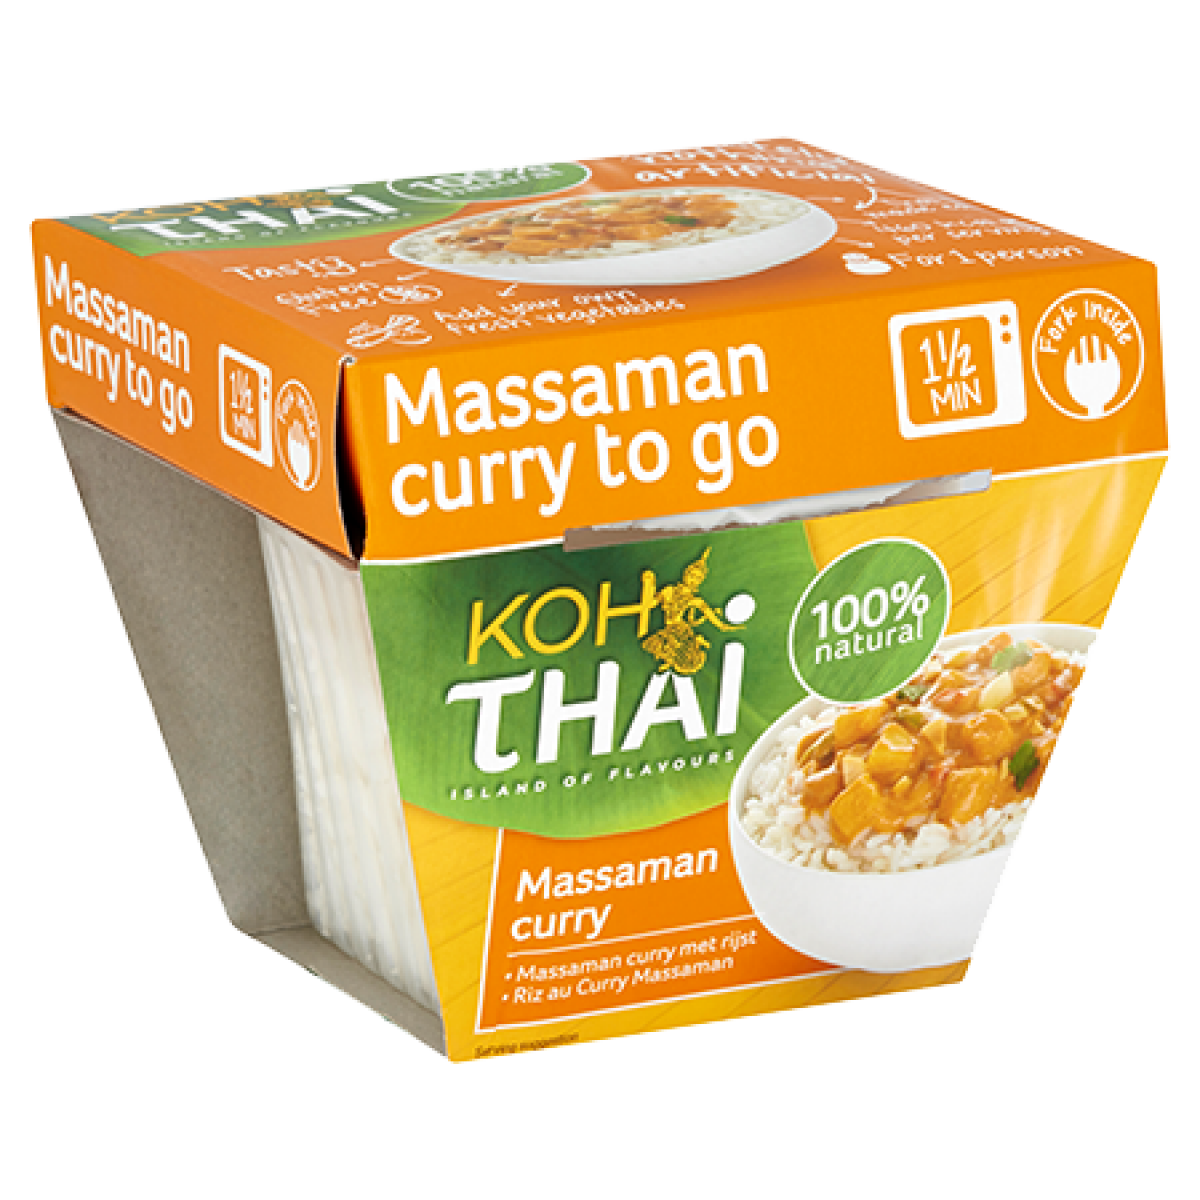 Massaman Curry To Go